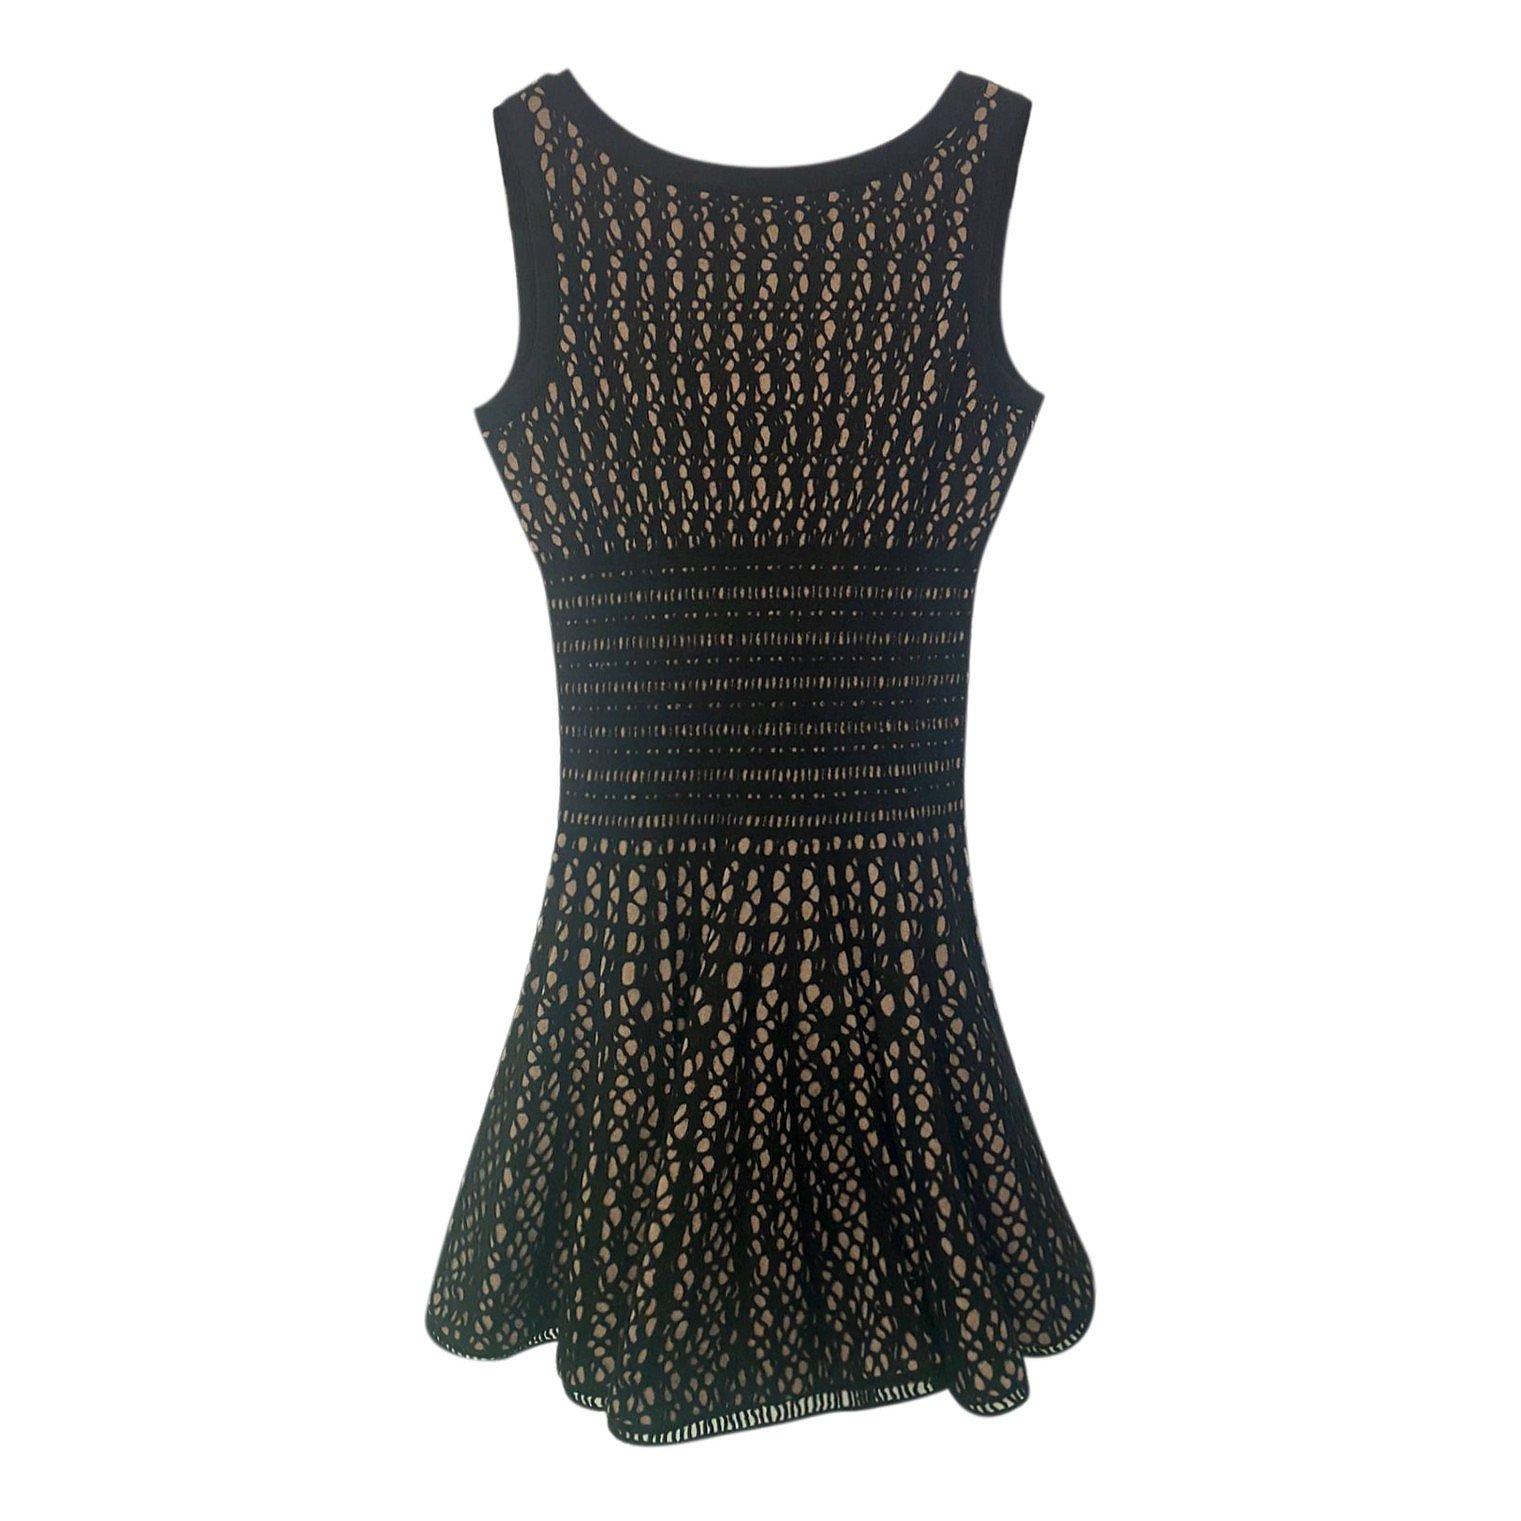 Alaïa Sleeveless Knit Dress